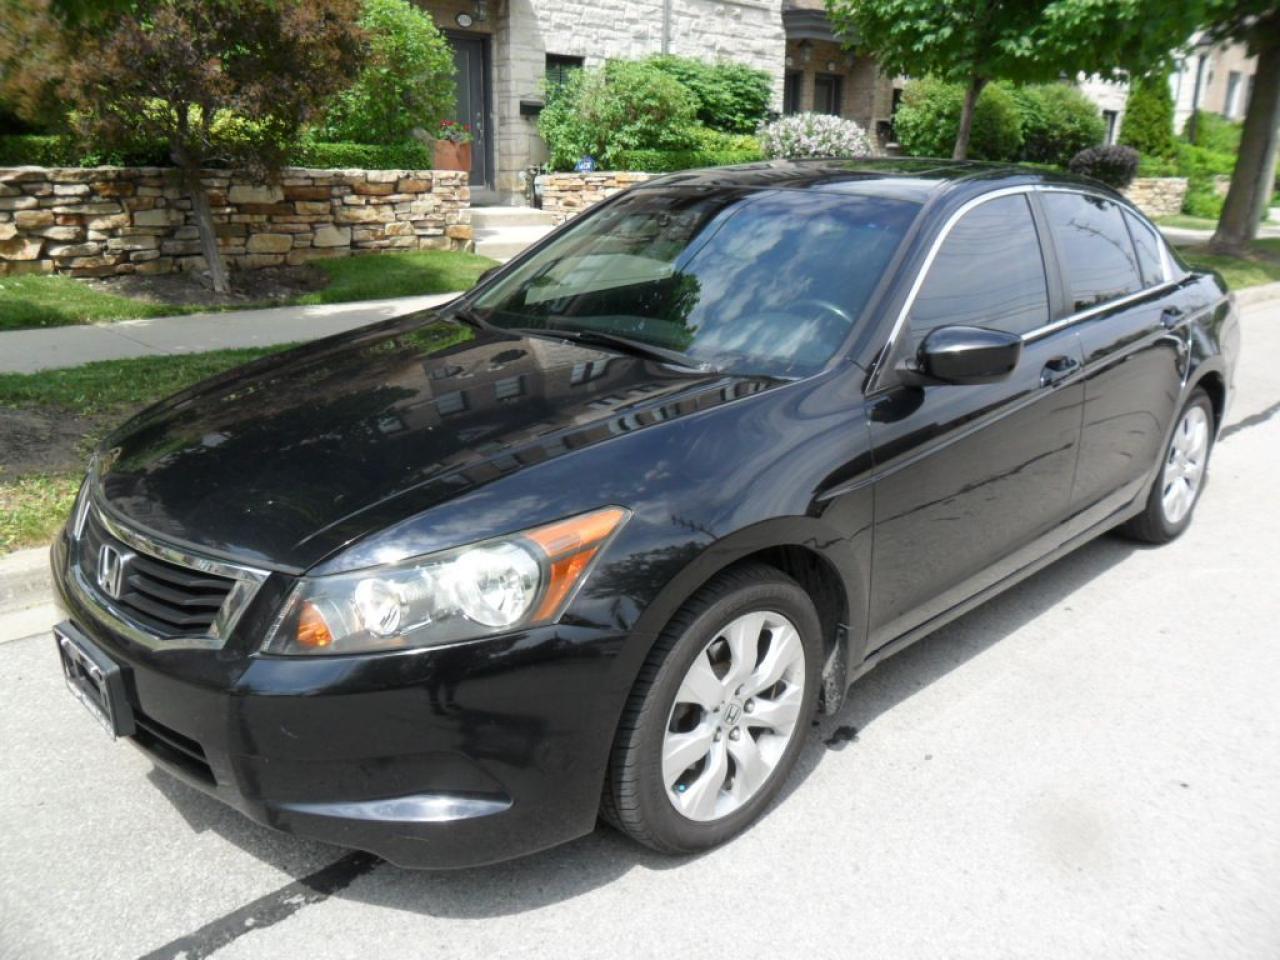 Photo of Black 2008 Honda Accord